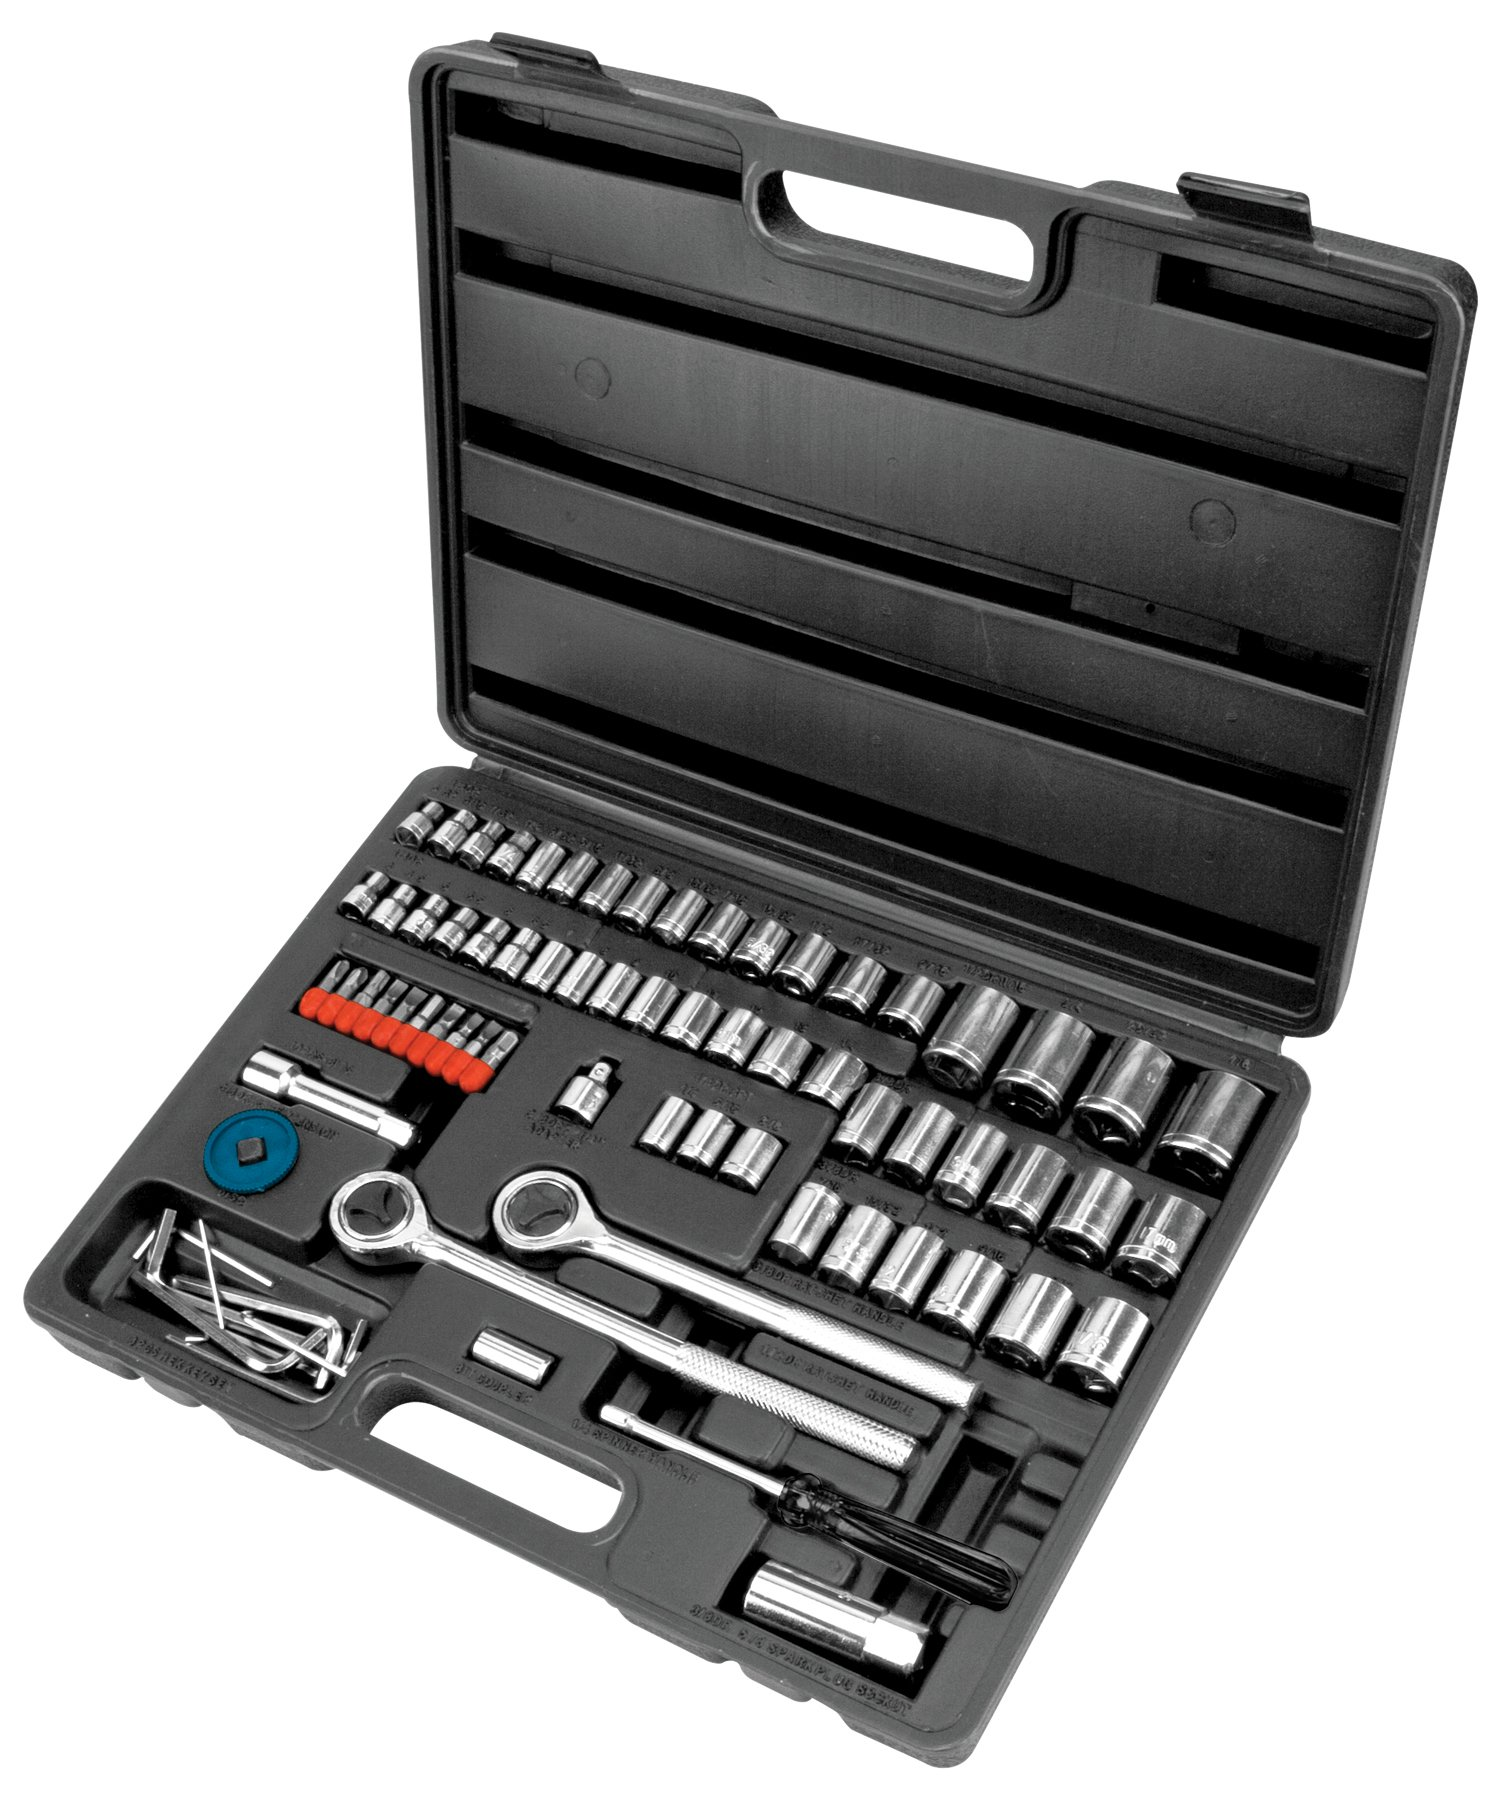 Performance Tool W1183 SAE/Metric 82-Piece Socket (1/4'', 3/8'' & 1/2'' Drive) & Bet Set